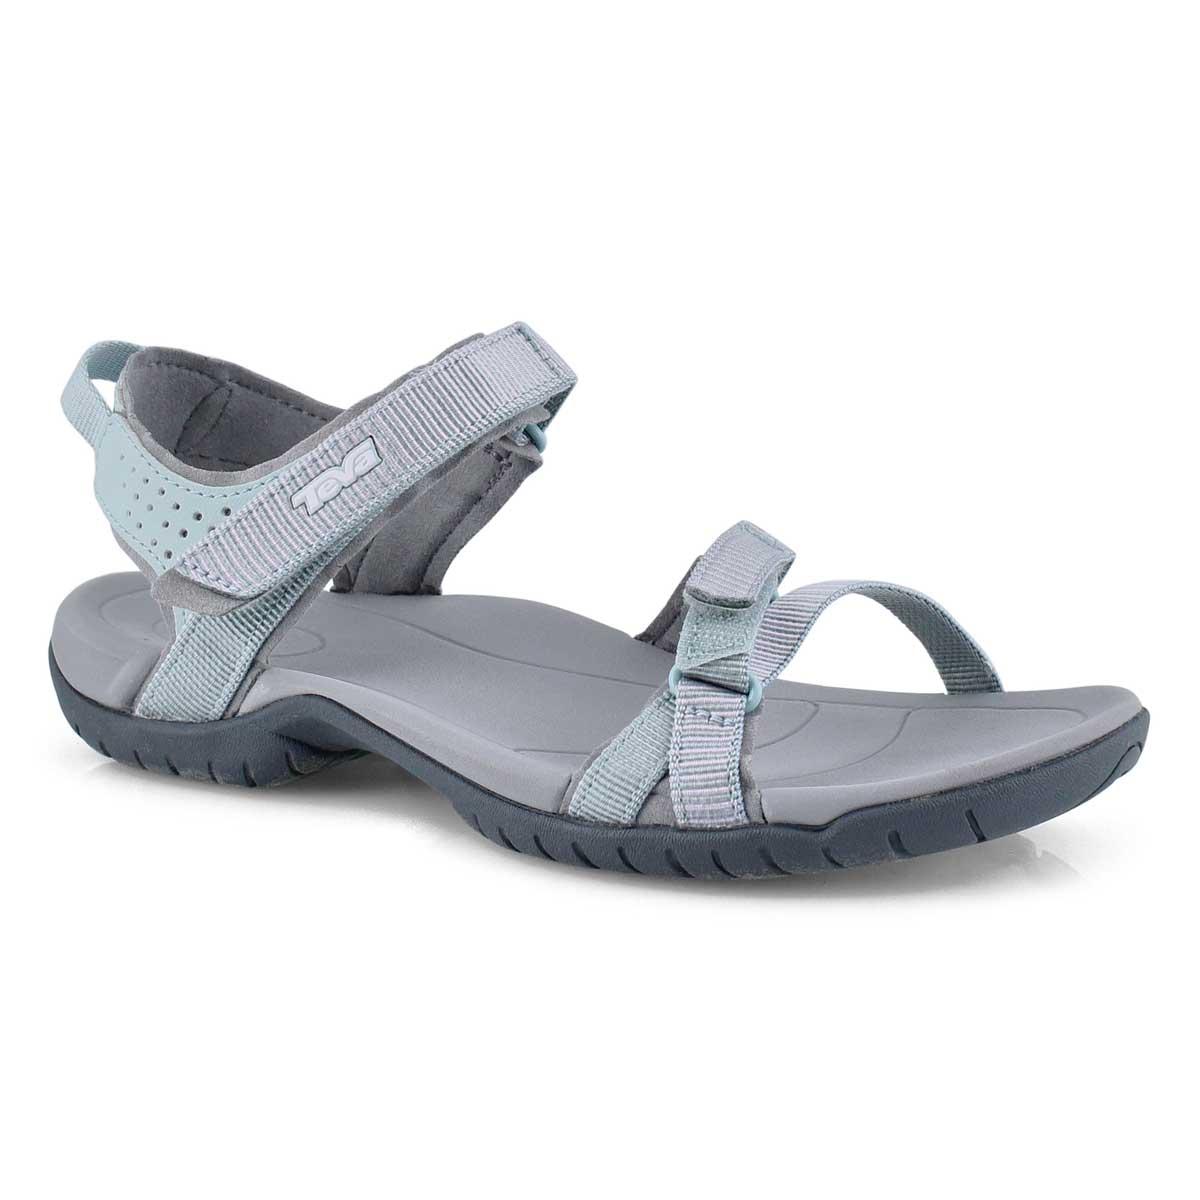 Sandale sport Verra, gris brume, fem.